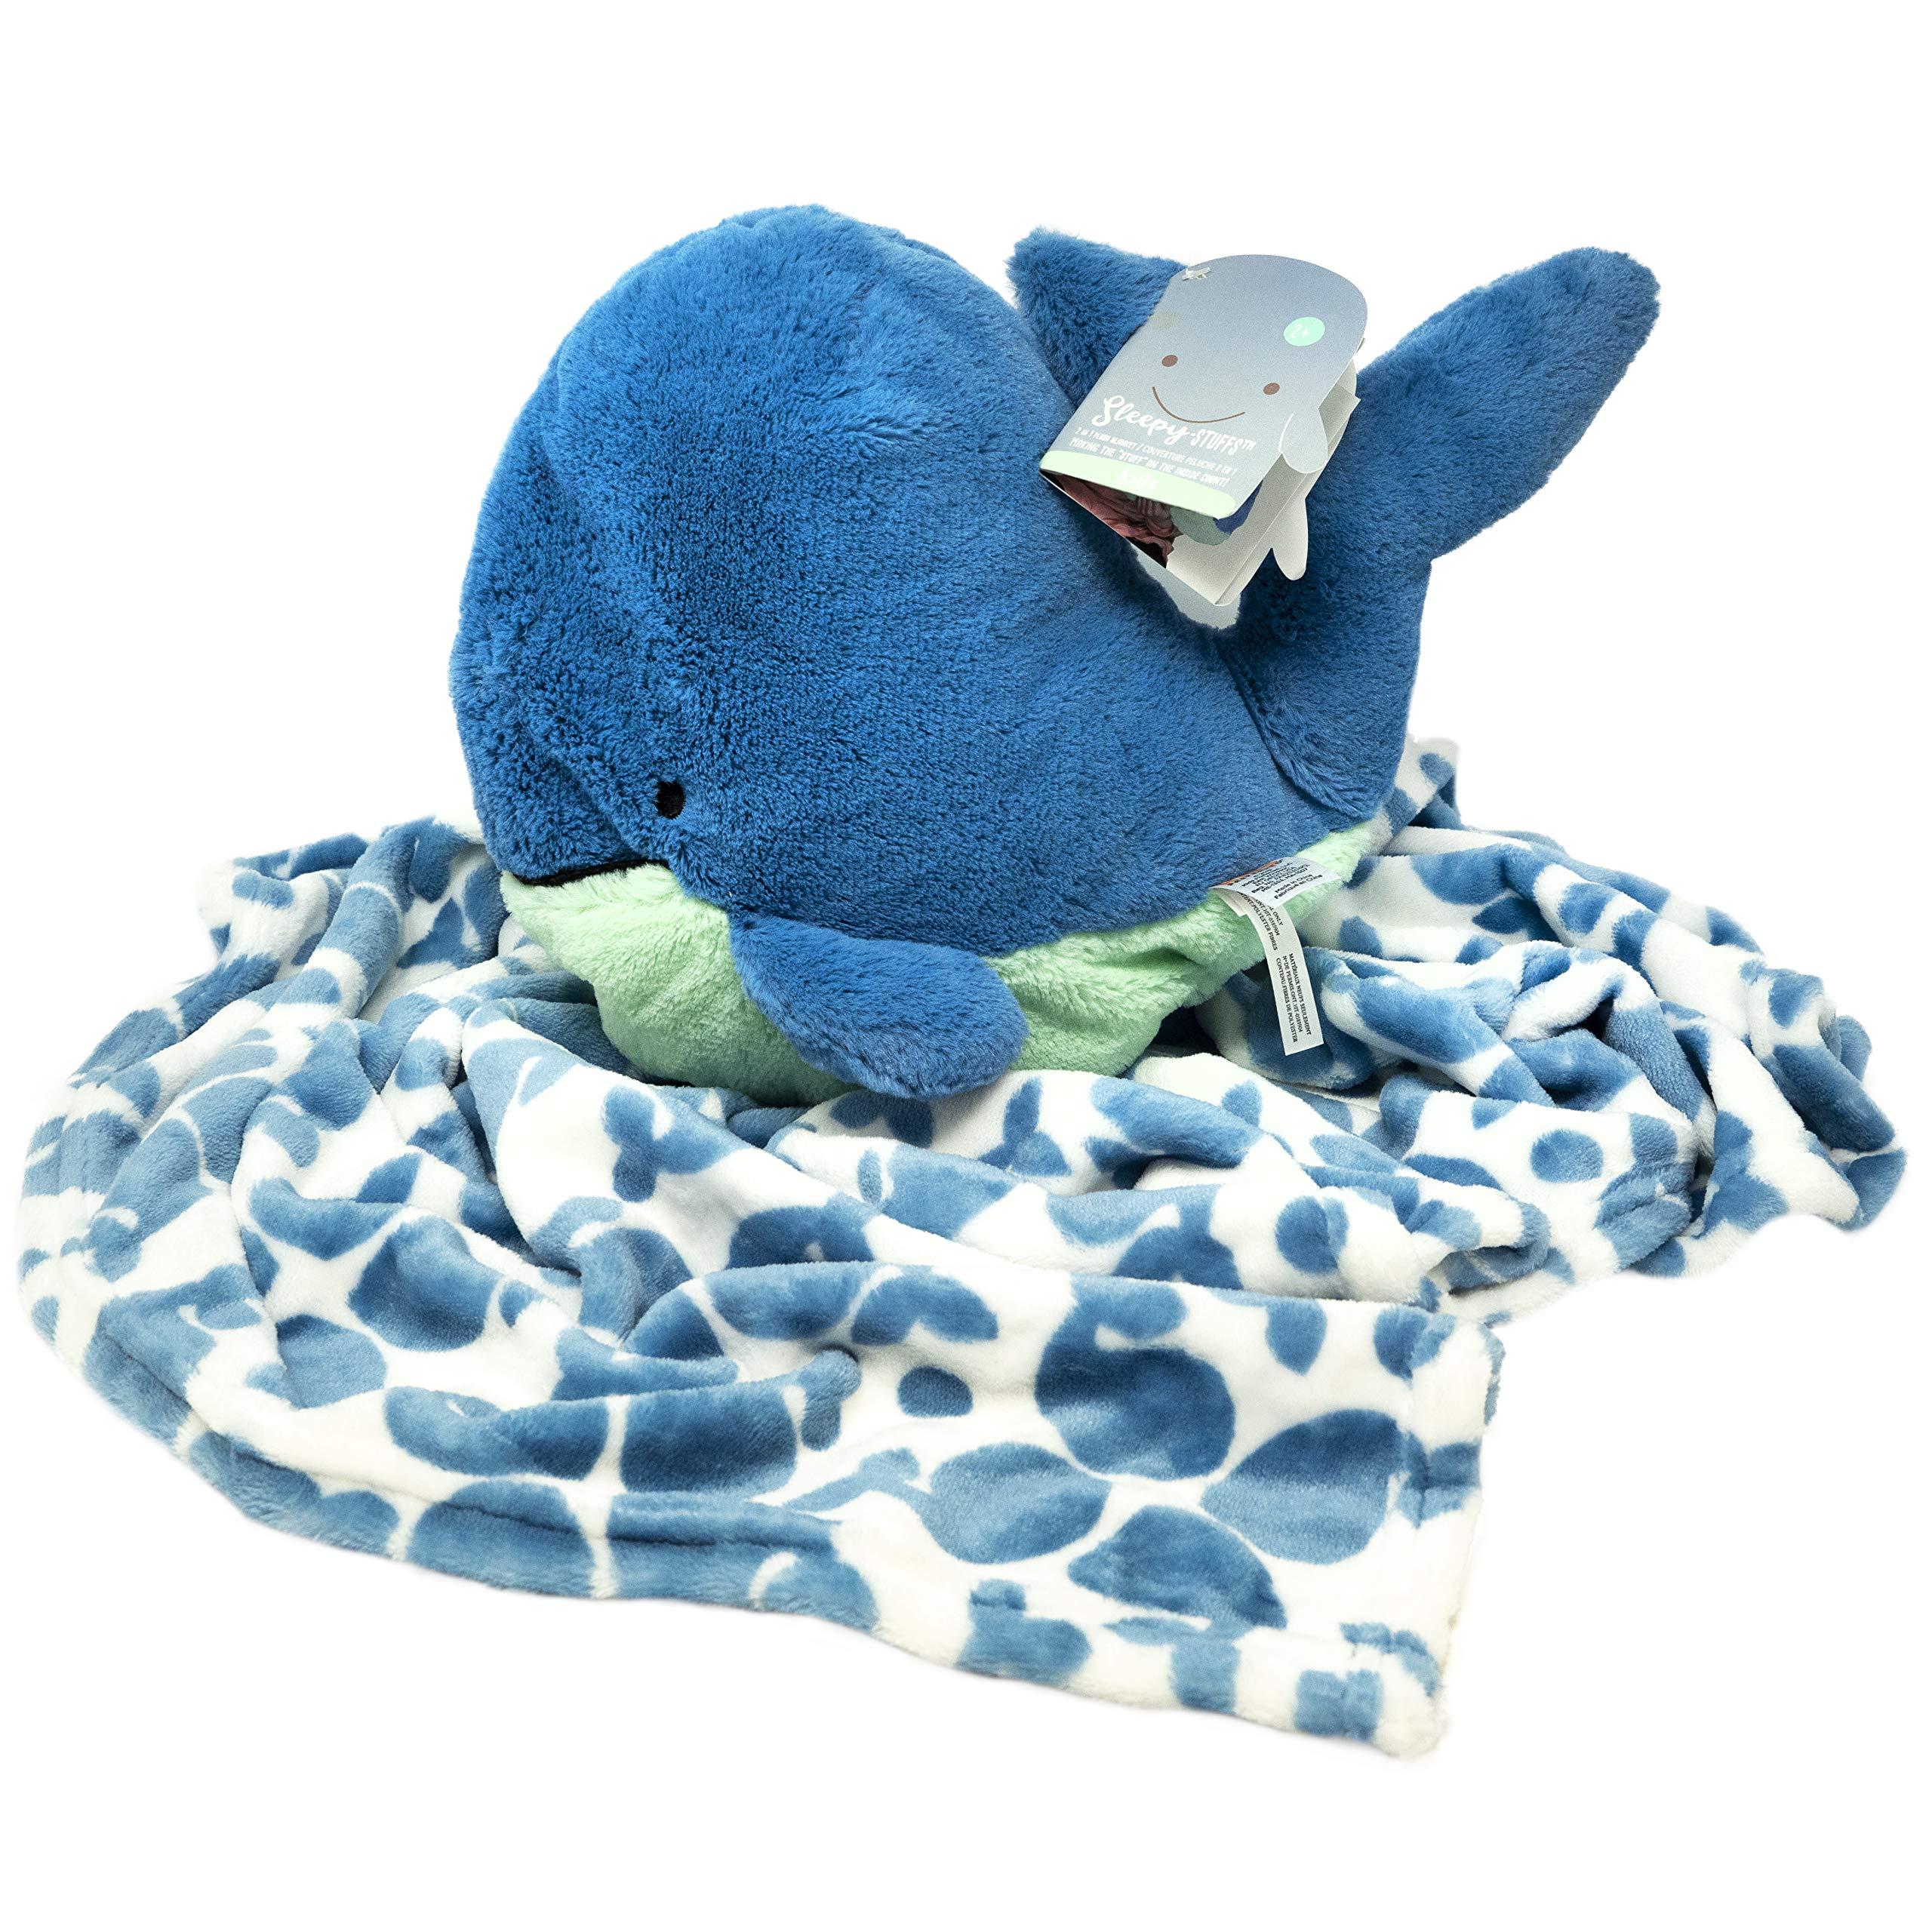 Kids Preferred Rise & Shine Sleepy Stuffs - Plush Stuffed Animal Blanket - Whale